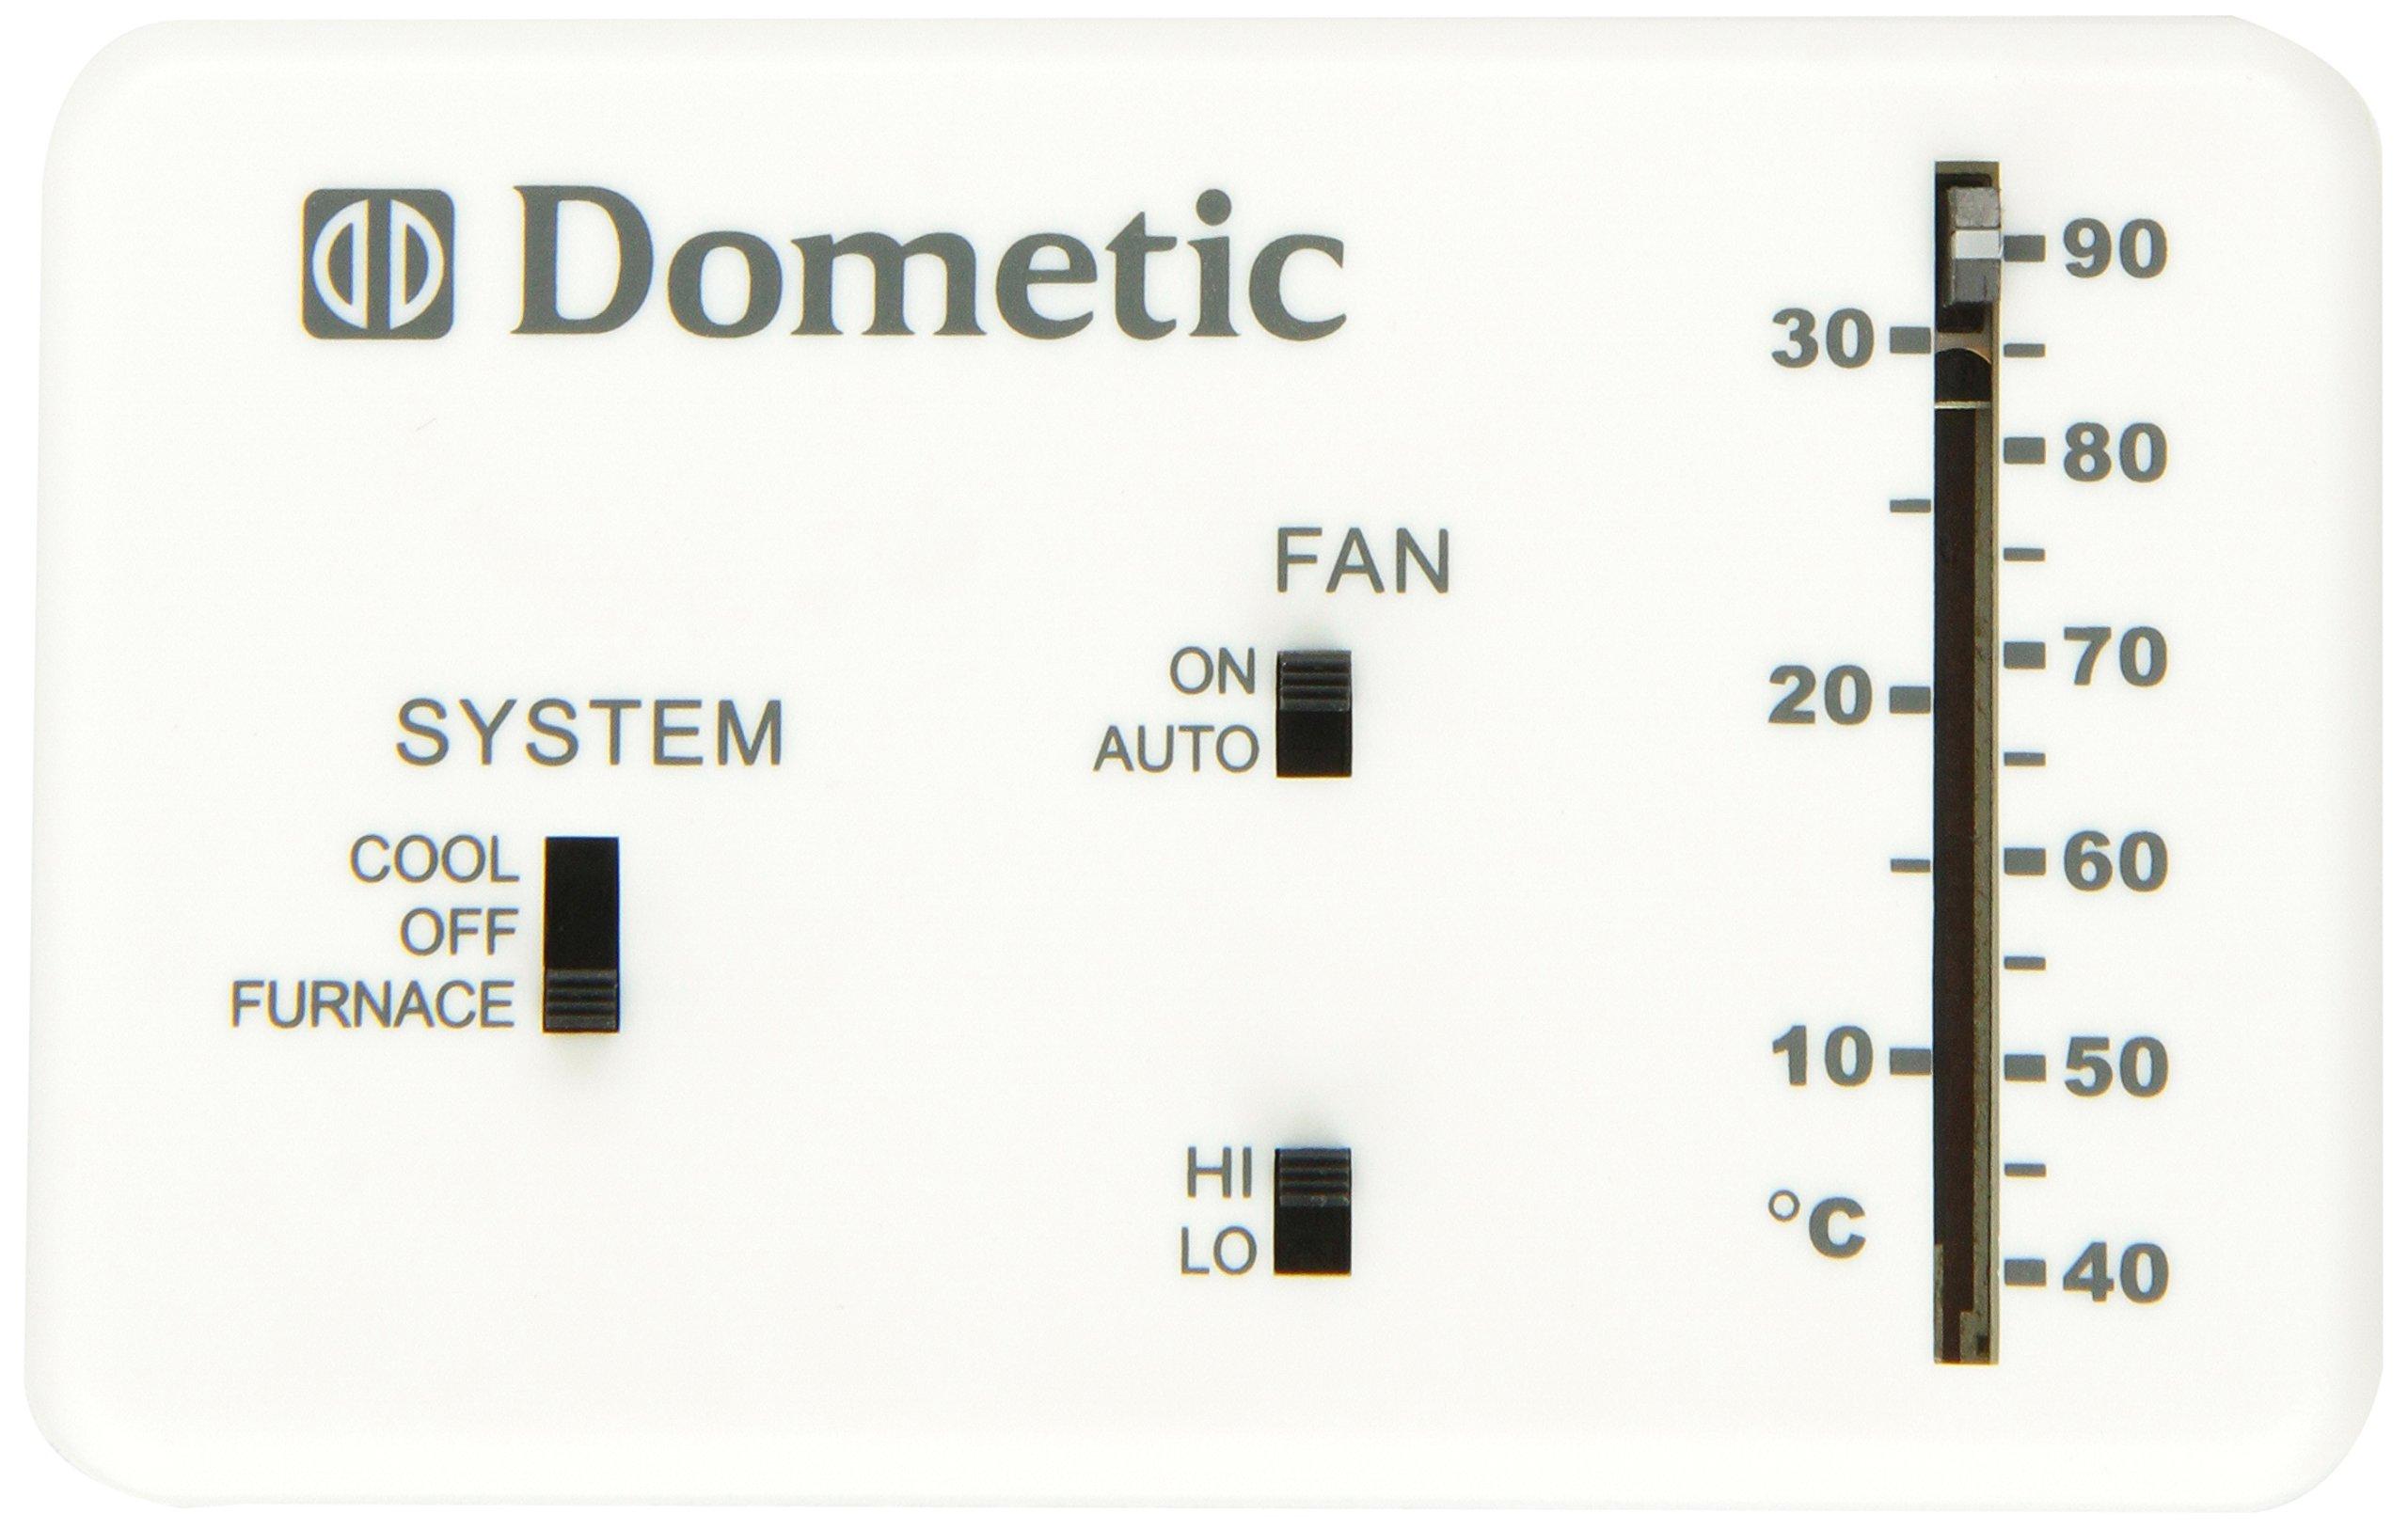 Dometic Model 50